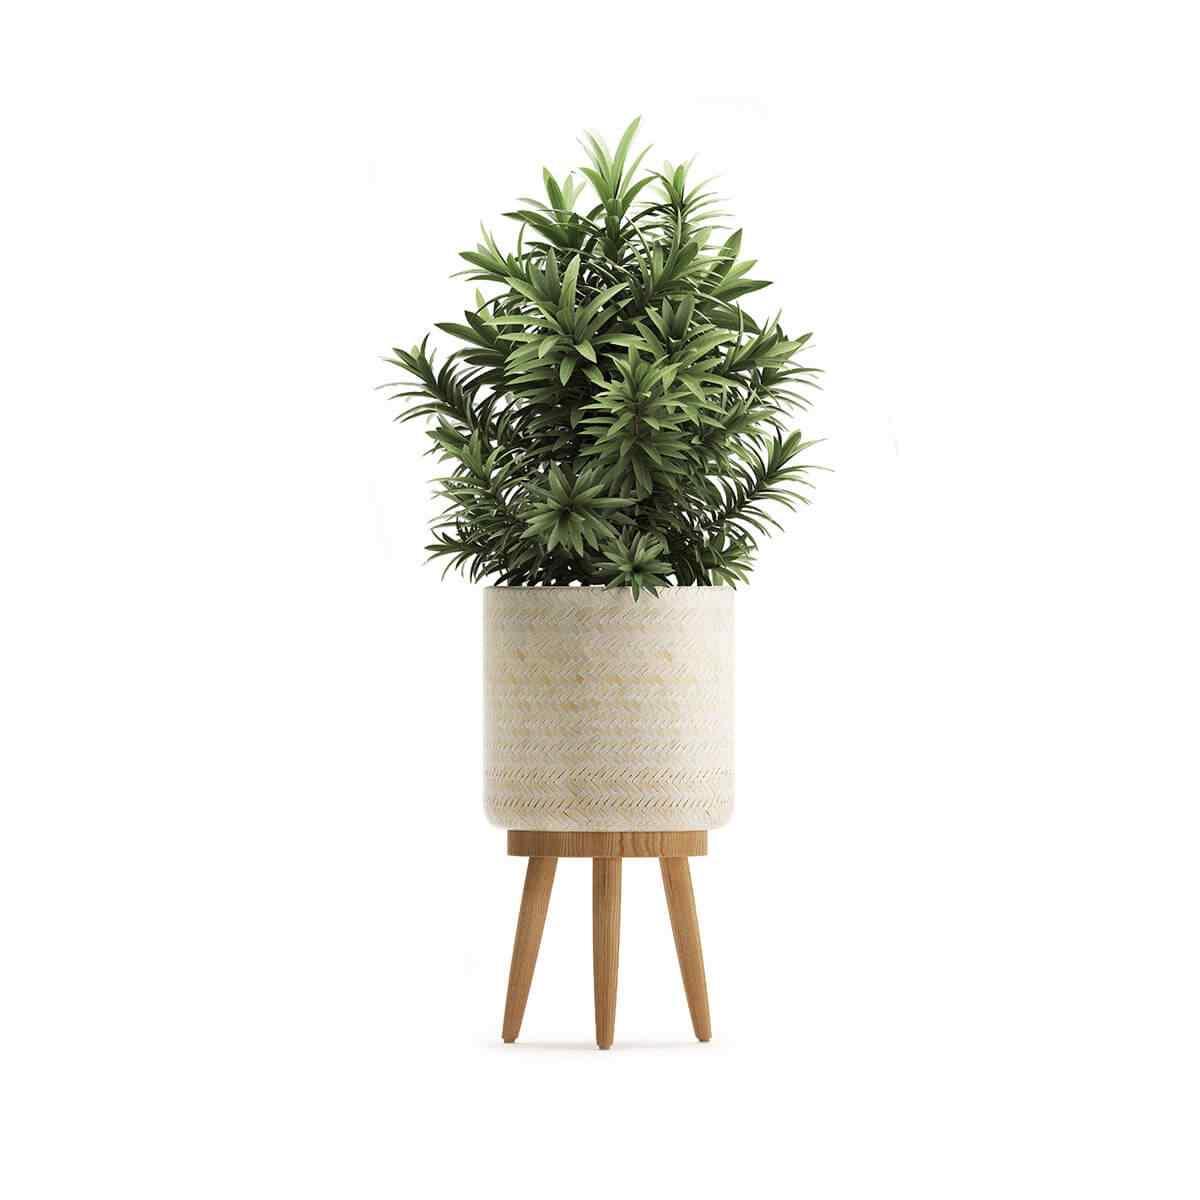 http://greenshade.com.au/wp-content/uploads/2018/09/product_07.jpg